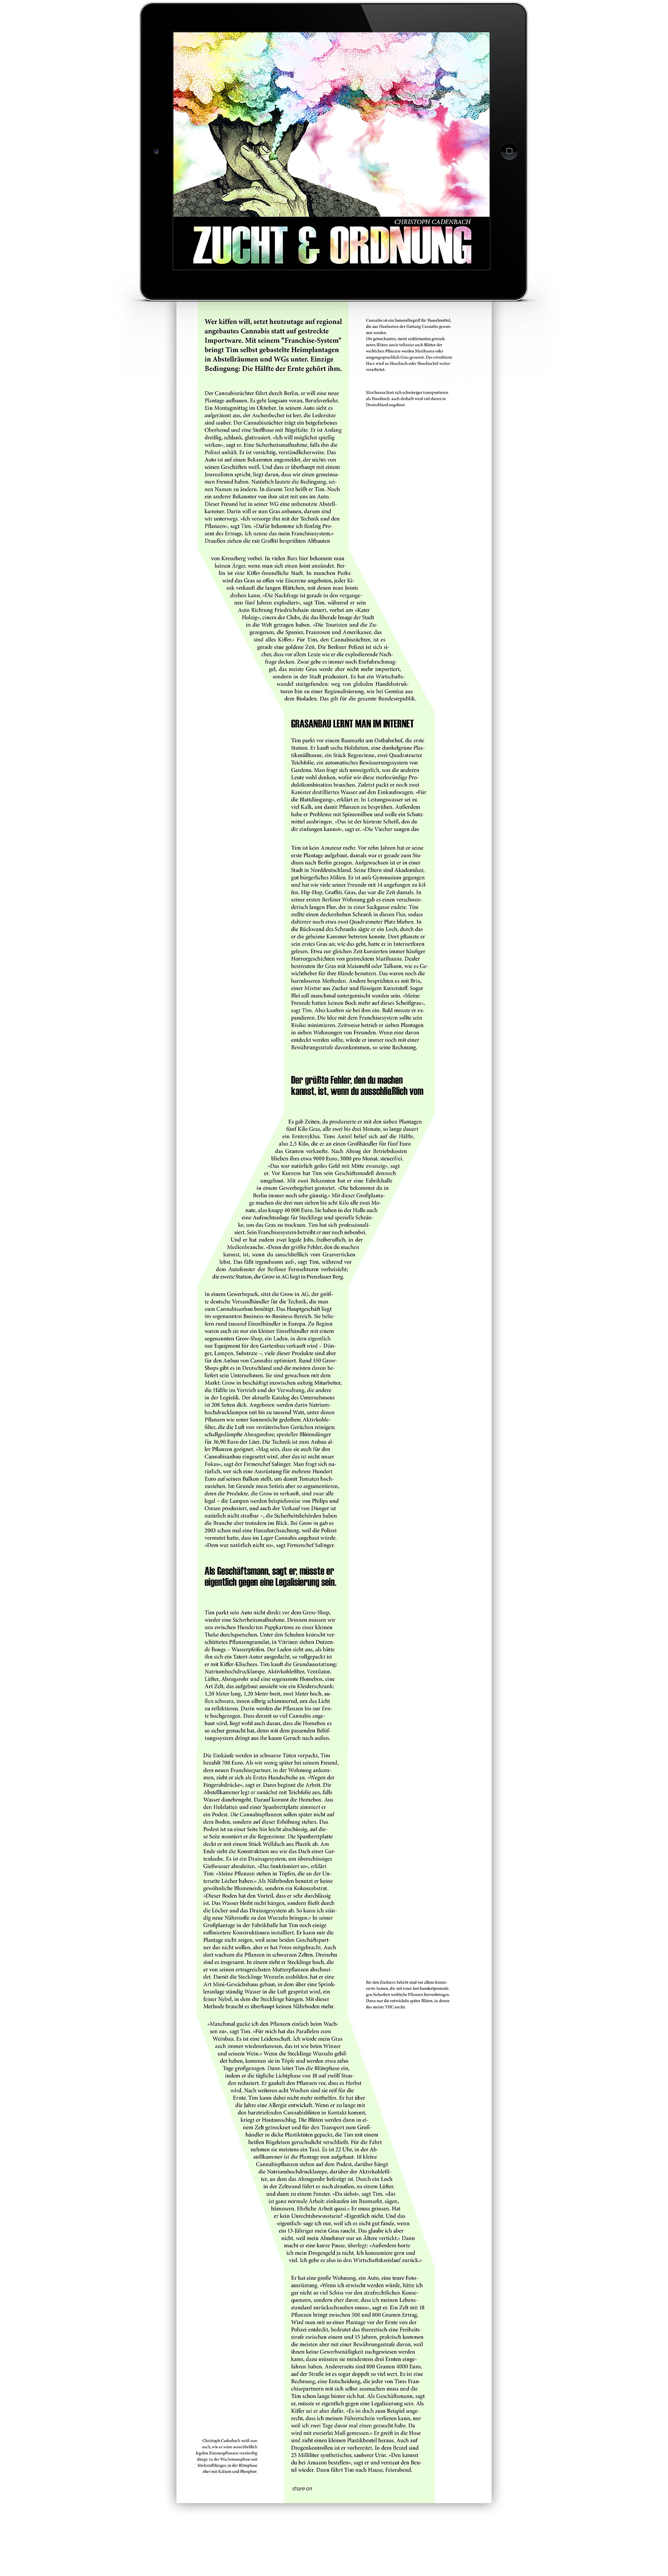 Layout interaktives iPad Magazin Reportage Taxi Canabis | Grafik Design Freelancer Berlin